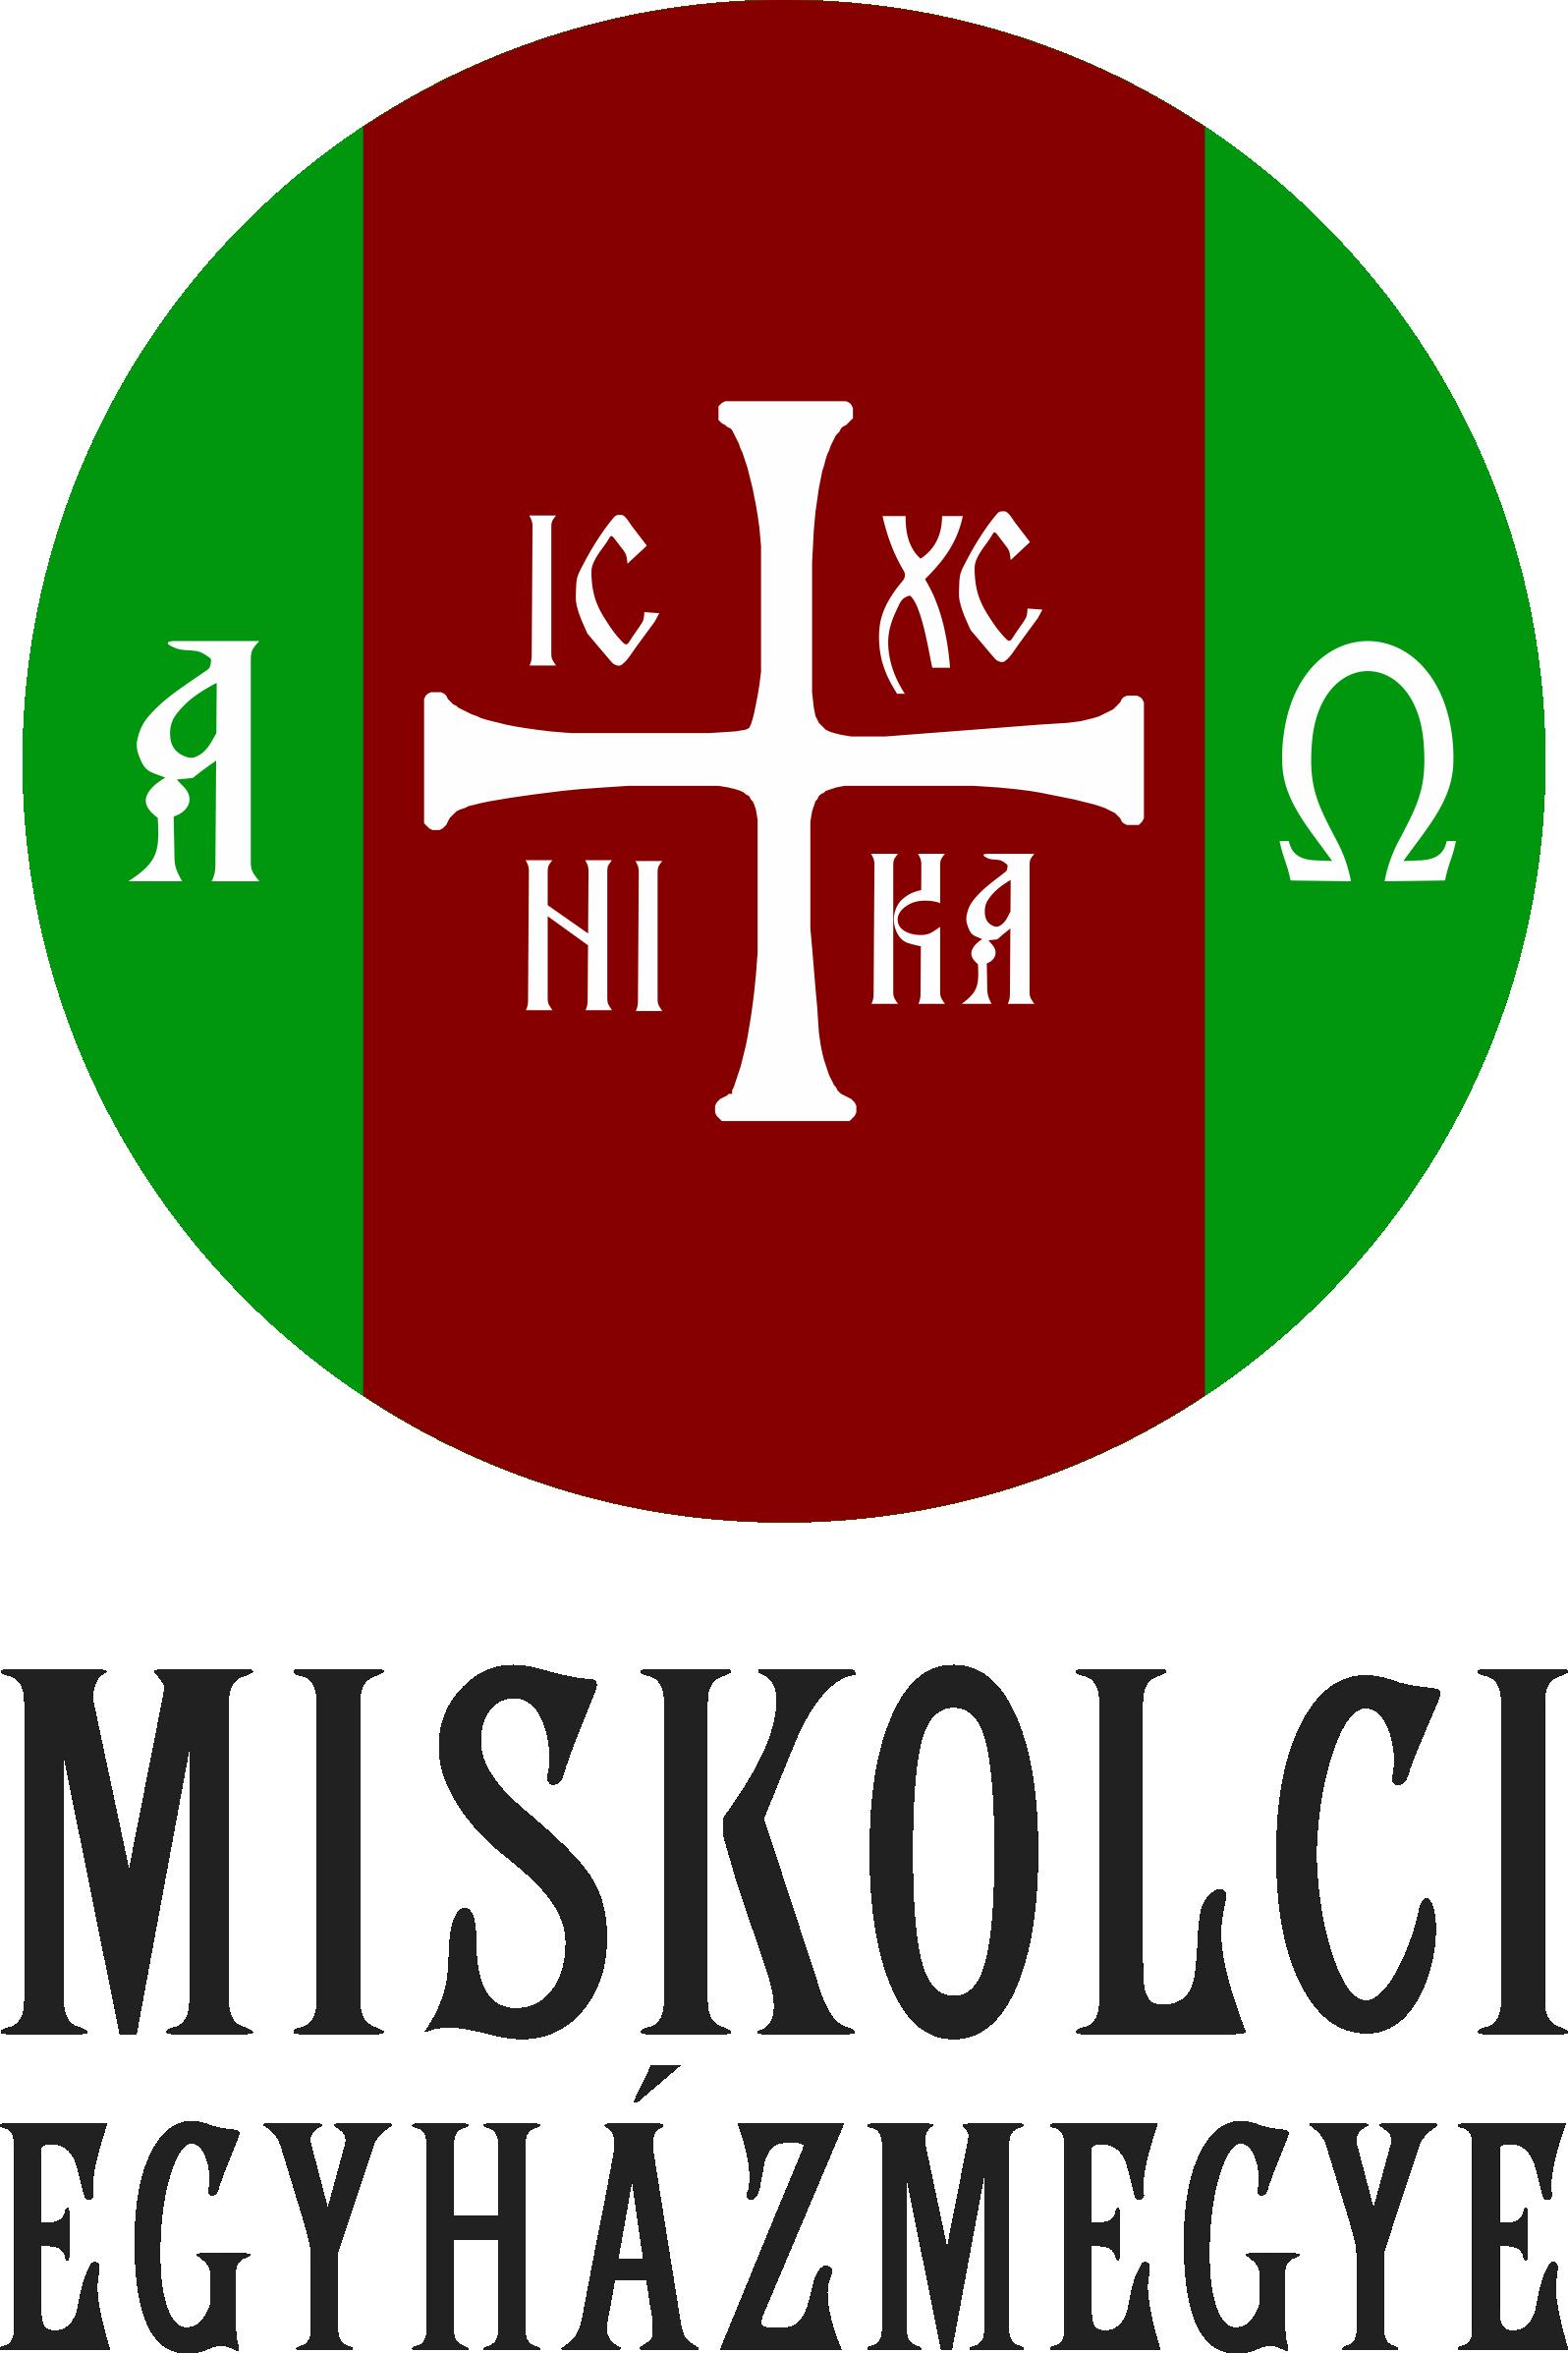 MIGORKAT